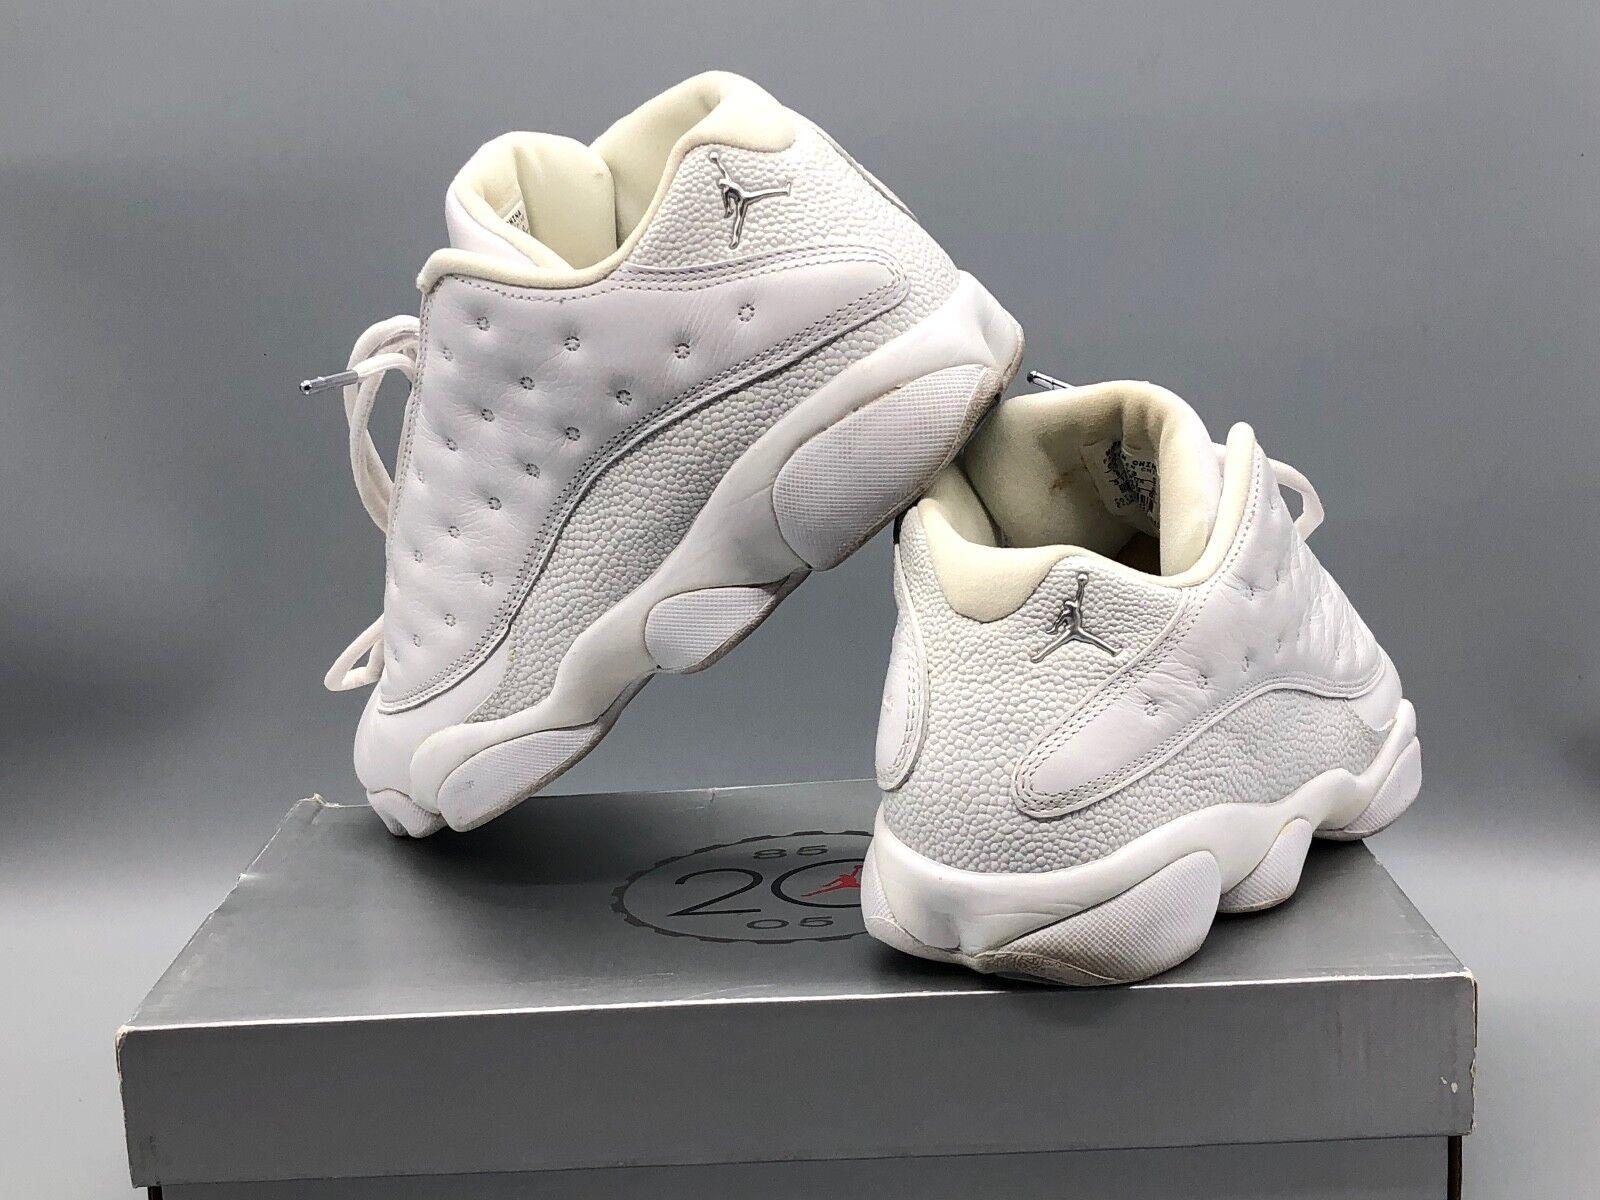 Nike air jordan retro - 13 niedrigen weiß / / silber / / Weiß 310810 103 096680